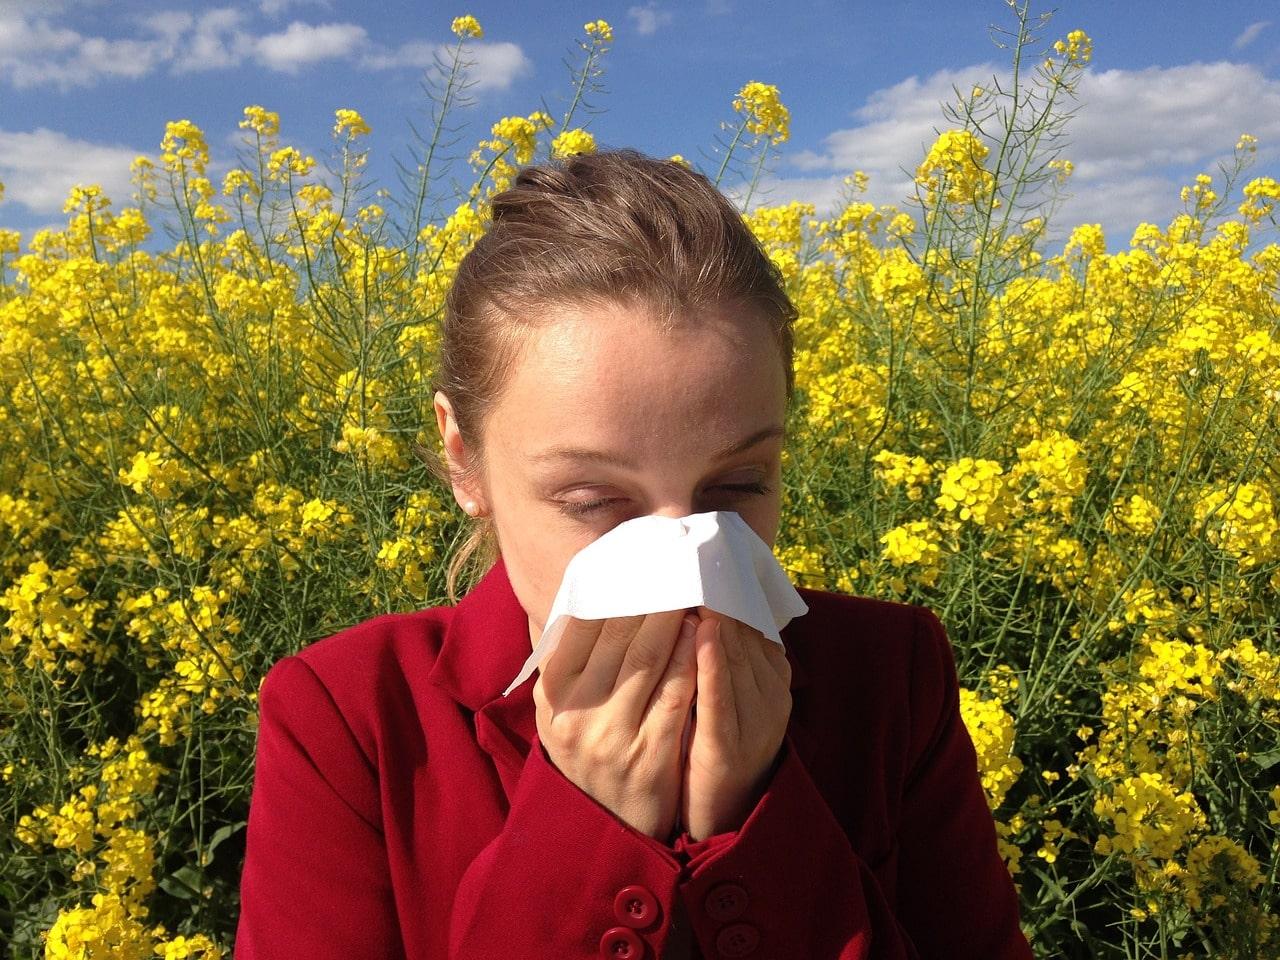 Alergia, asma